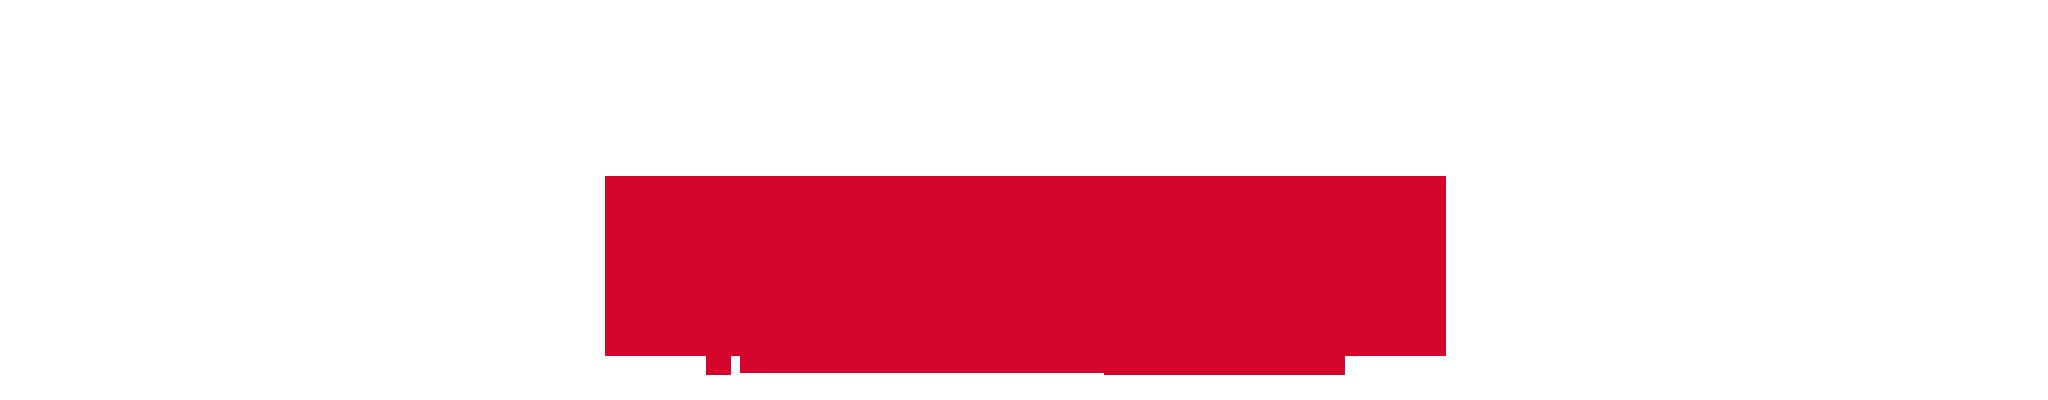 2048-400-tab-sp